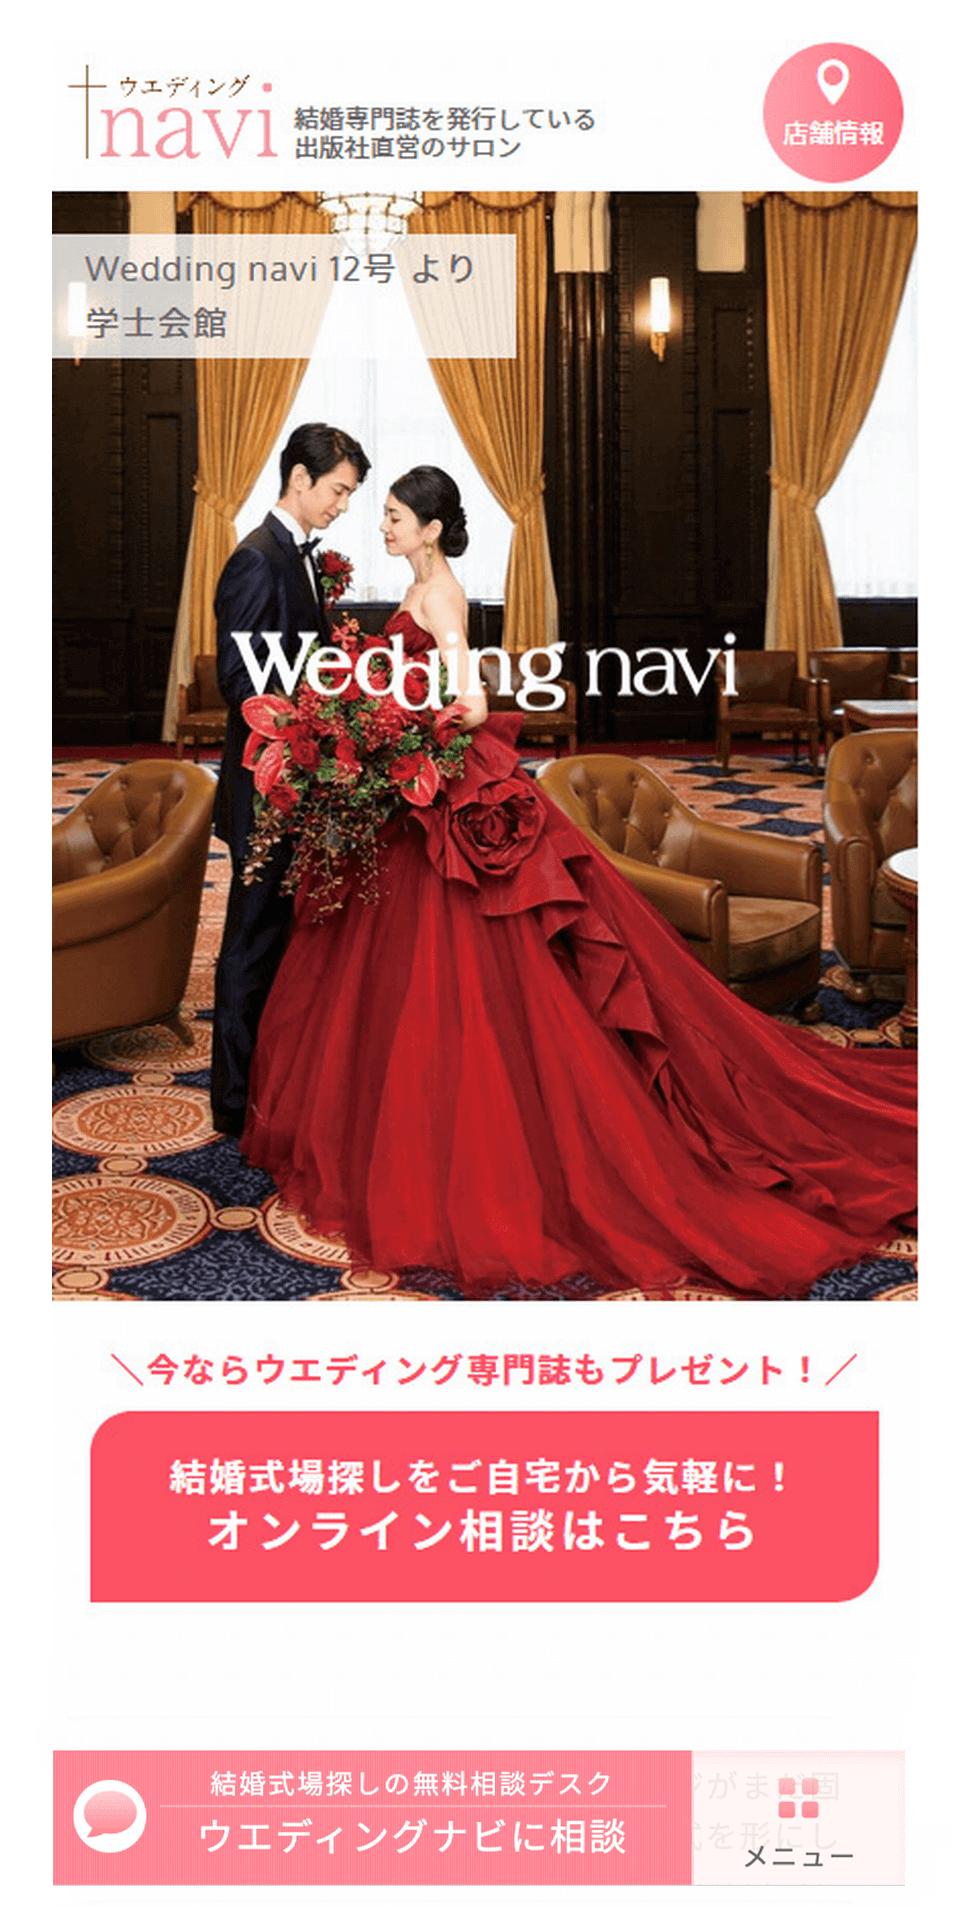 Wedding navi